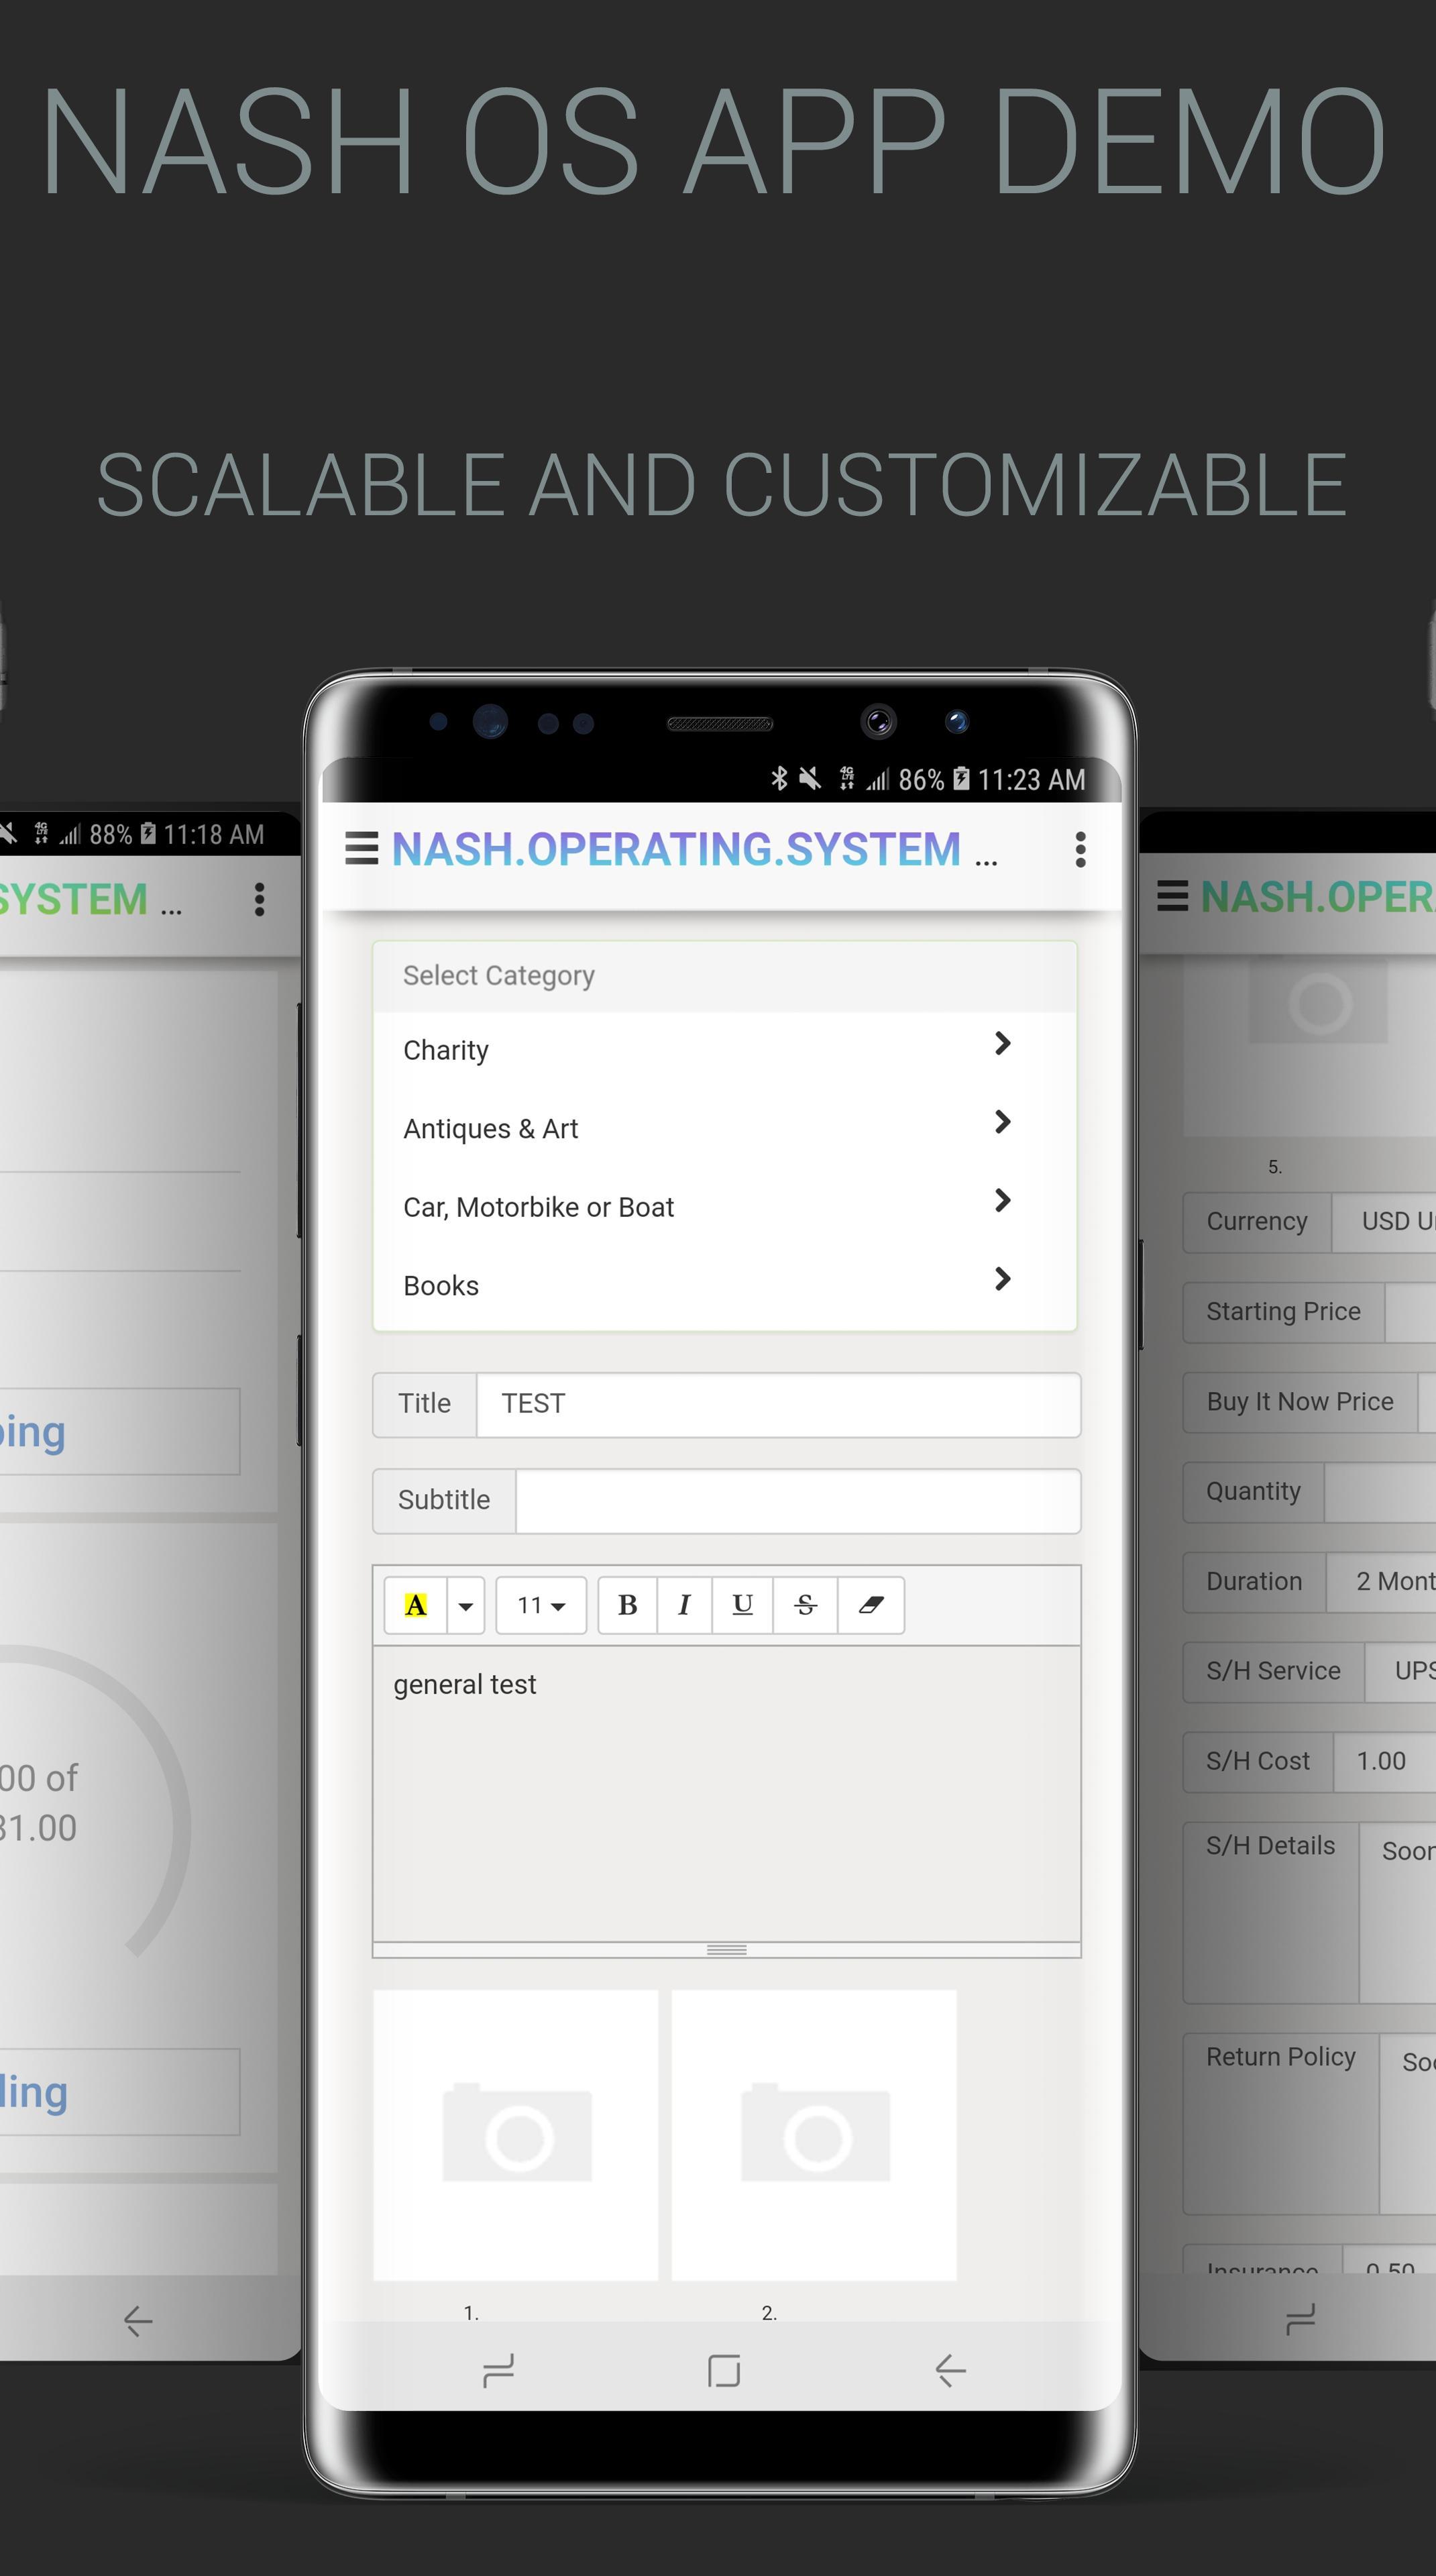 NASH OS APP (MOBILE DEMO) screenshot 5